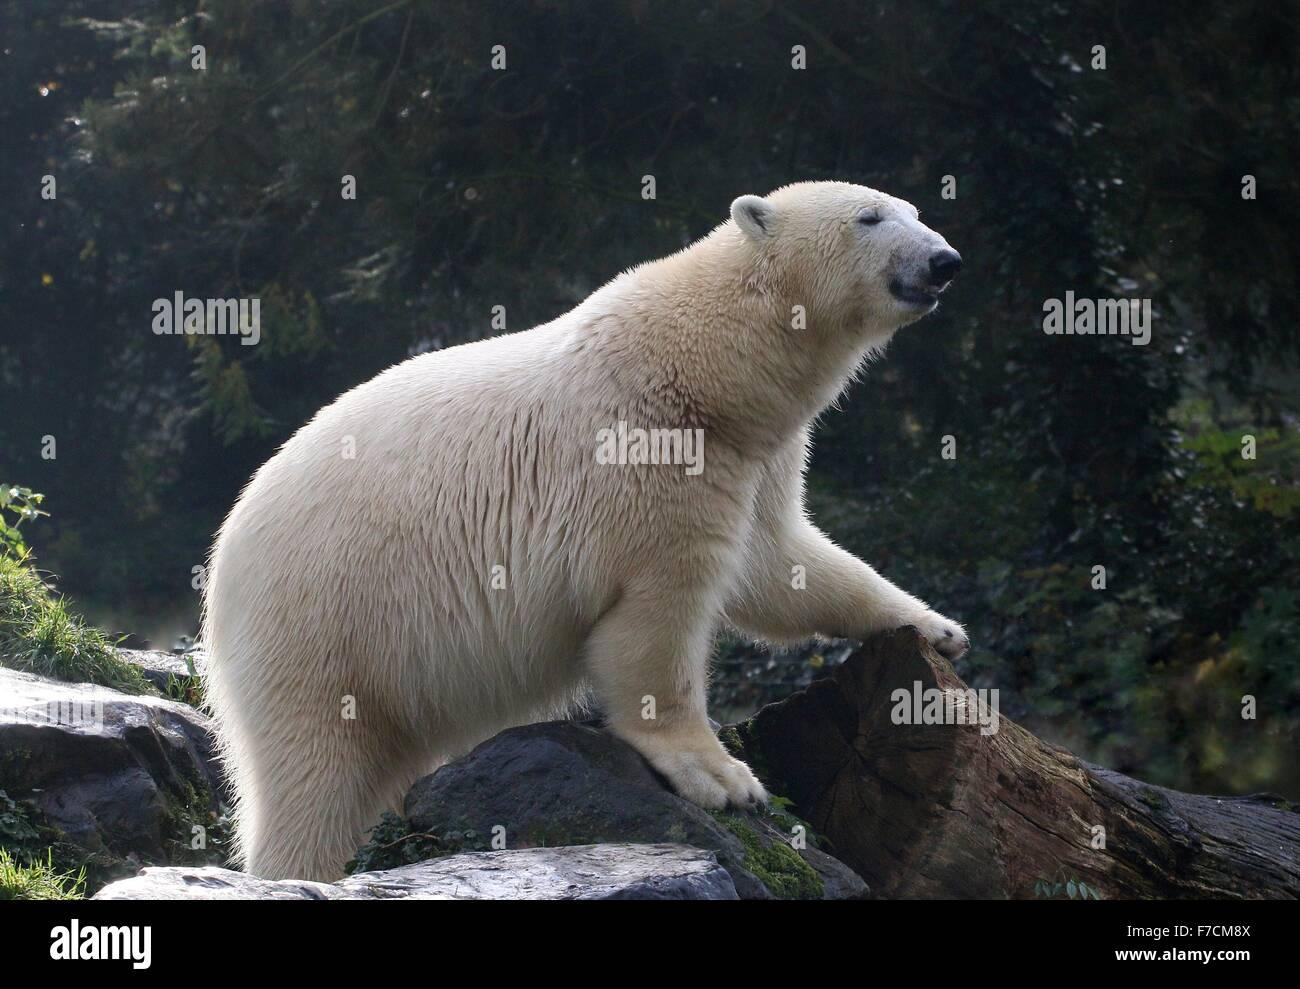 Coppia di orso polare (Ursus maritimus) esplorare Immagini Stock